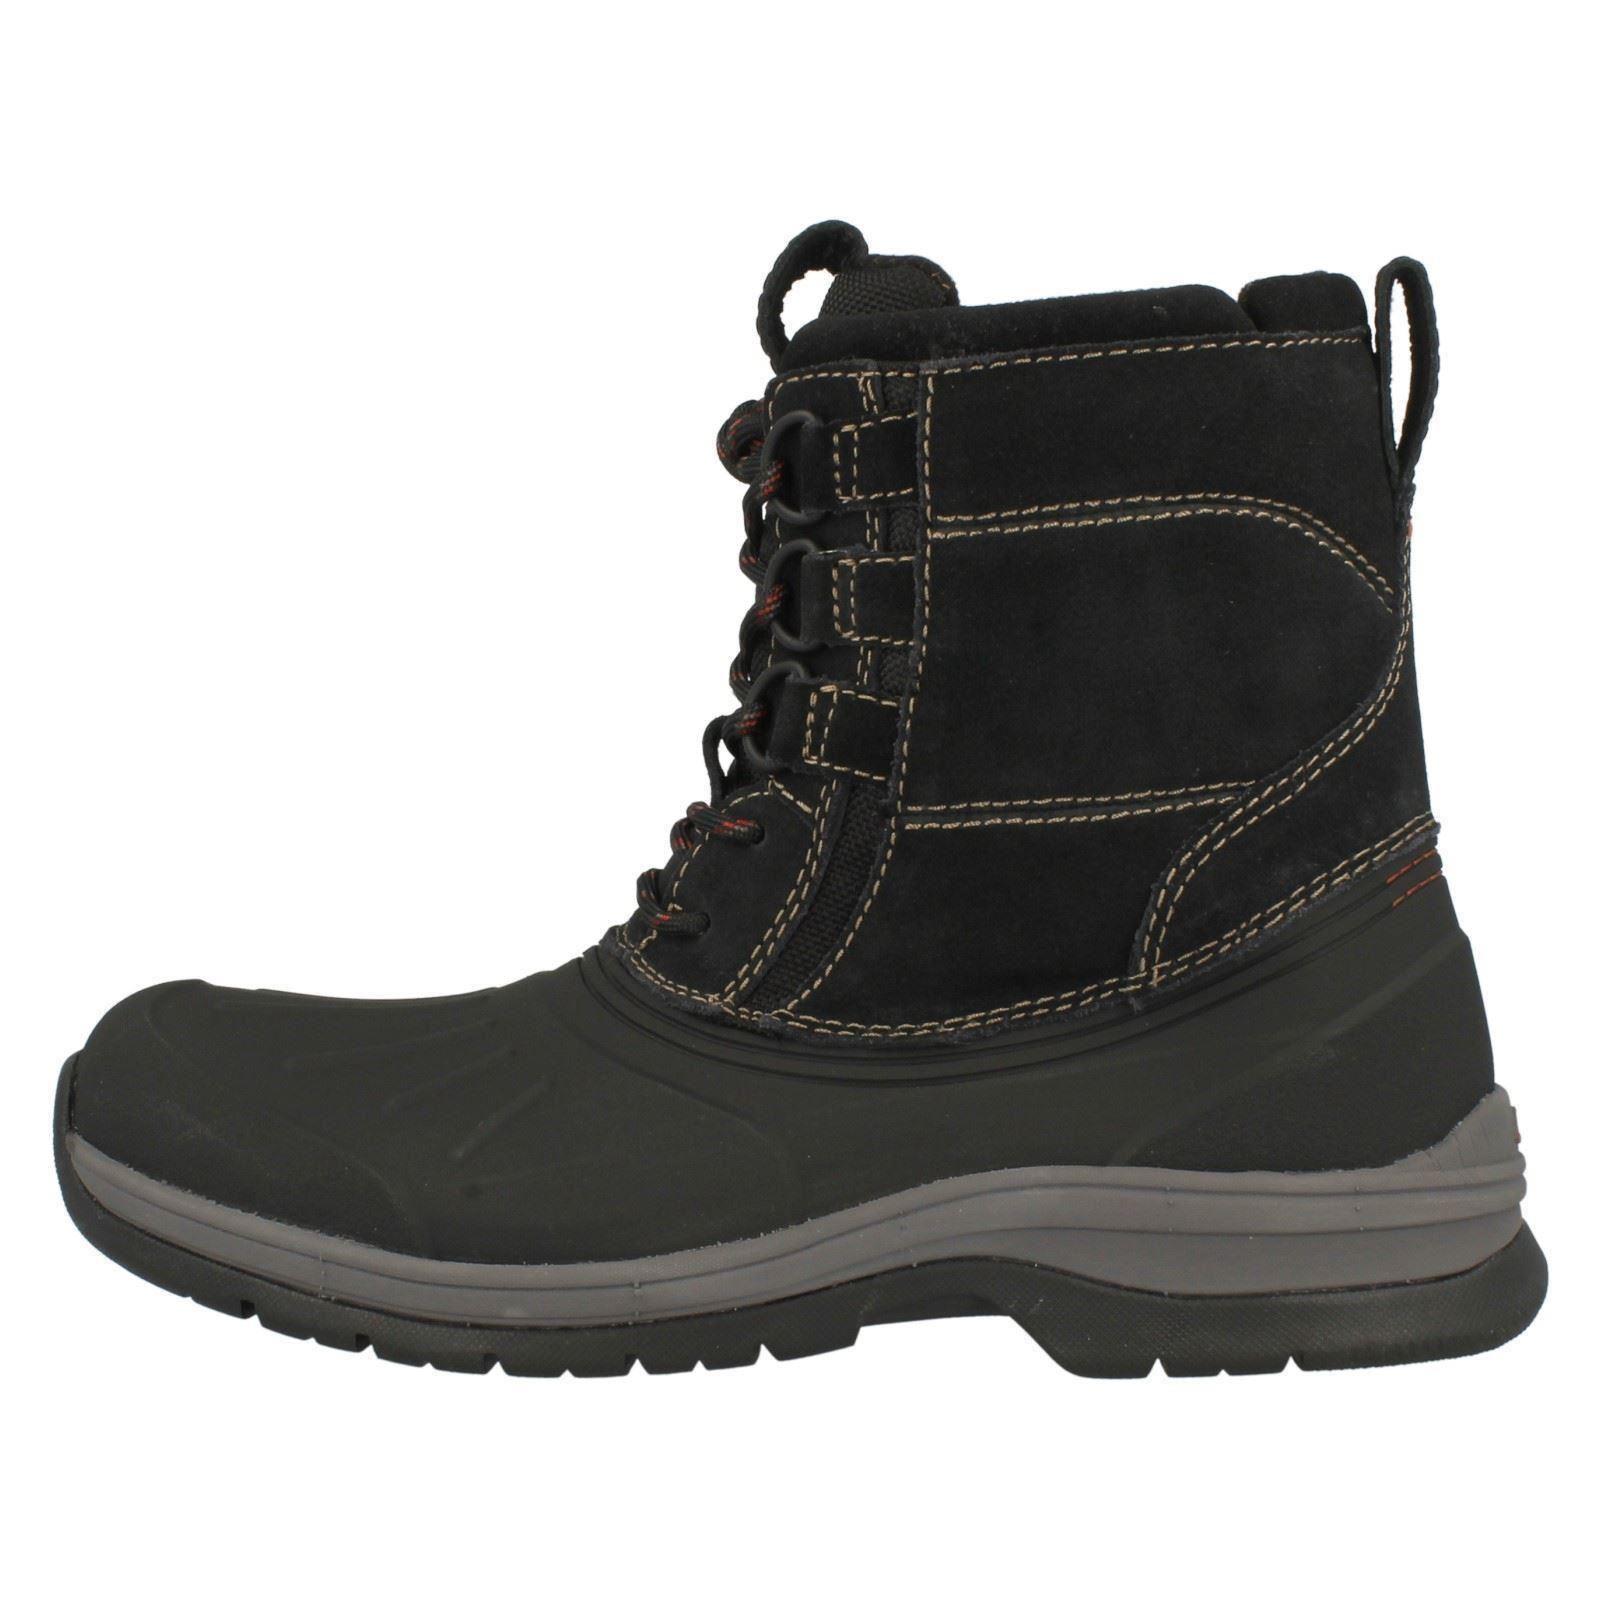 Mens-Clarks-Outdoor-Boots-Nashoba-Summit thumbnail 3